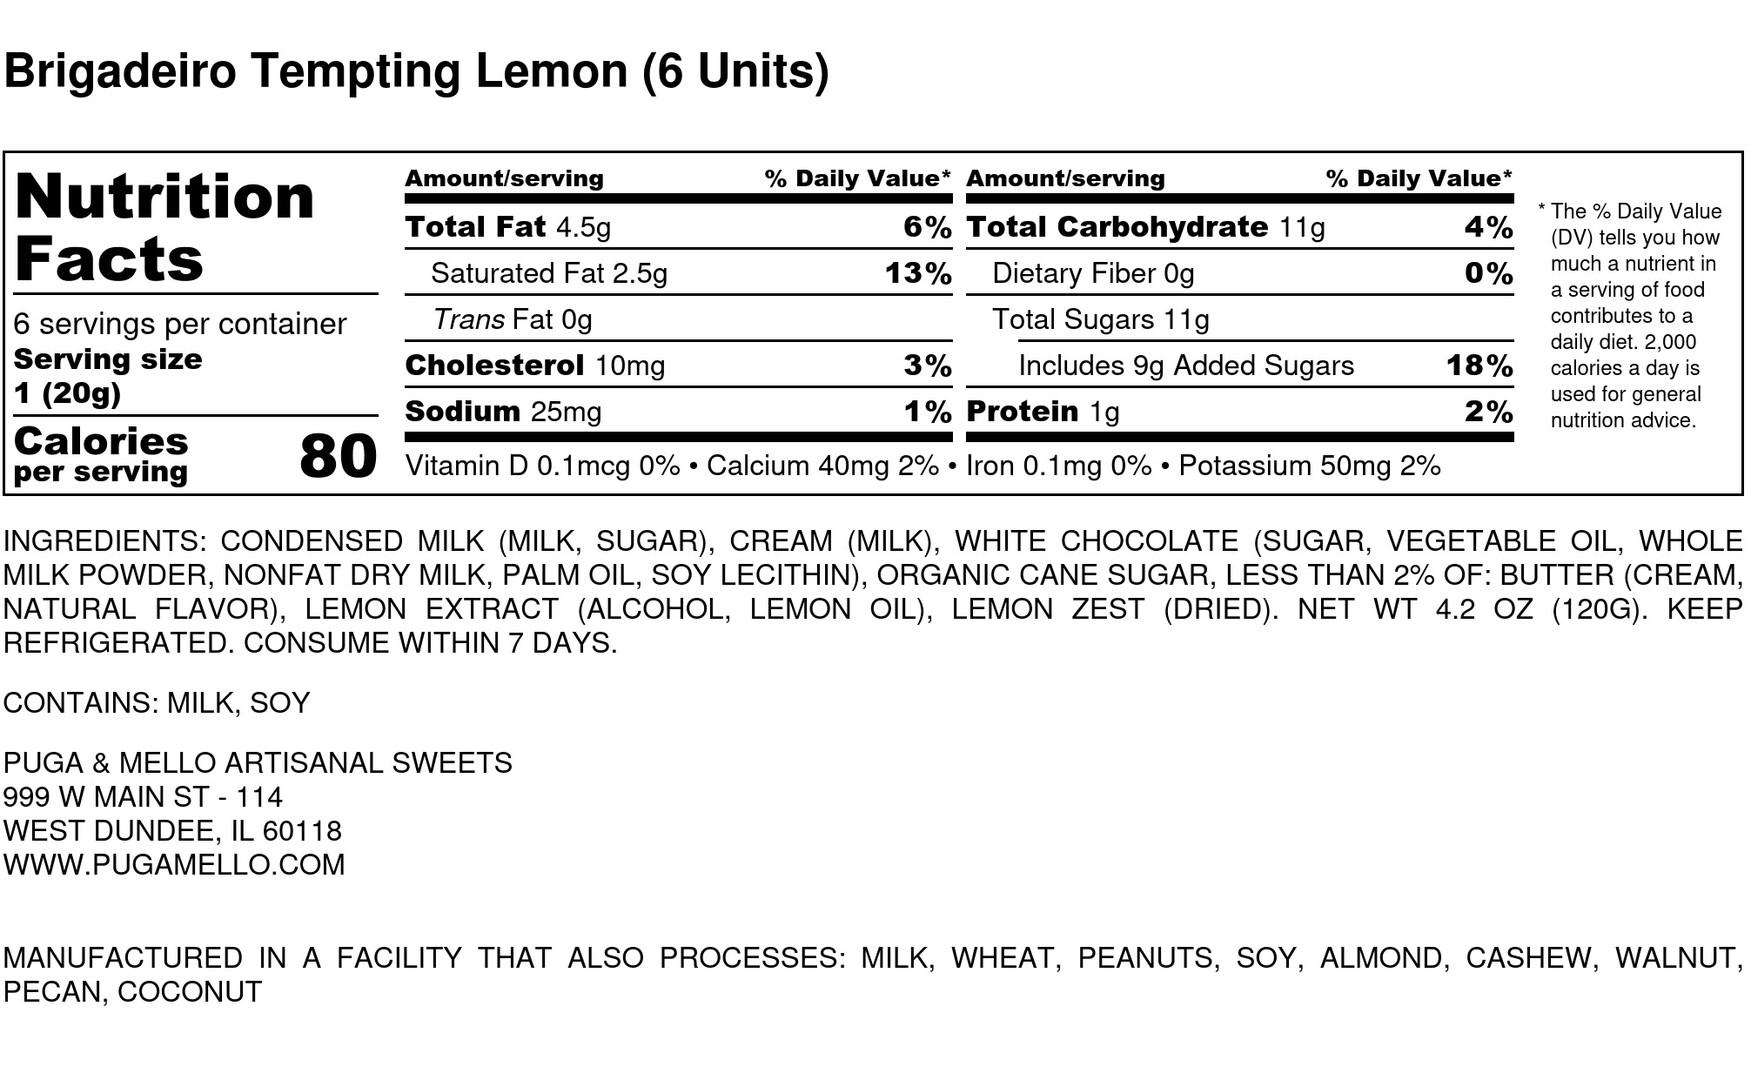 Brigadeiro Tempting Lemon (6 Units) - Nu